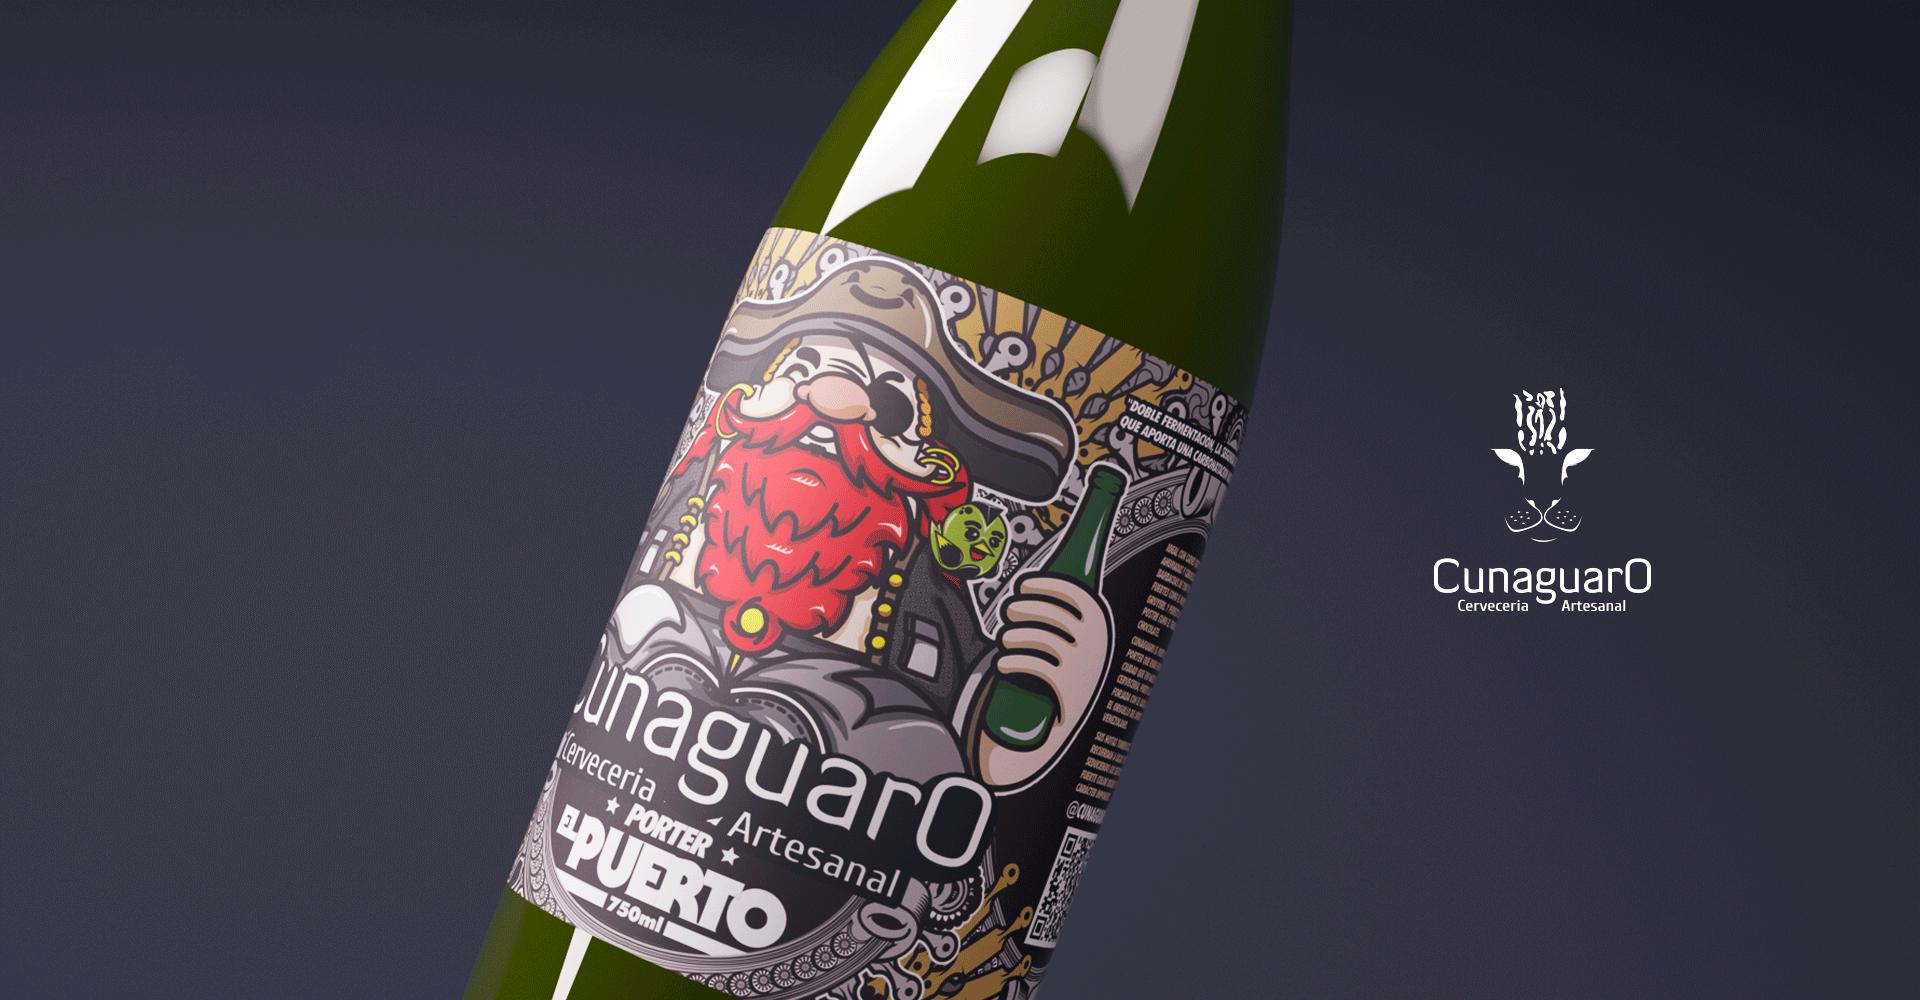 cunaguaro-beer-chocotoy-7.png